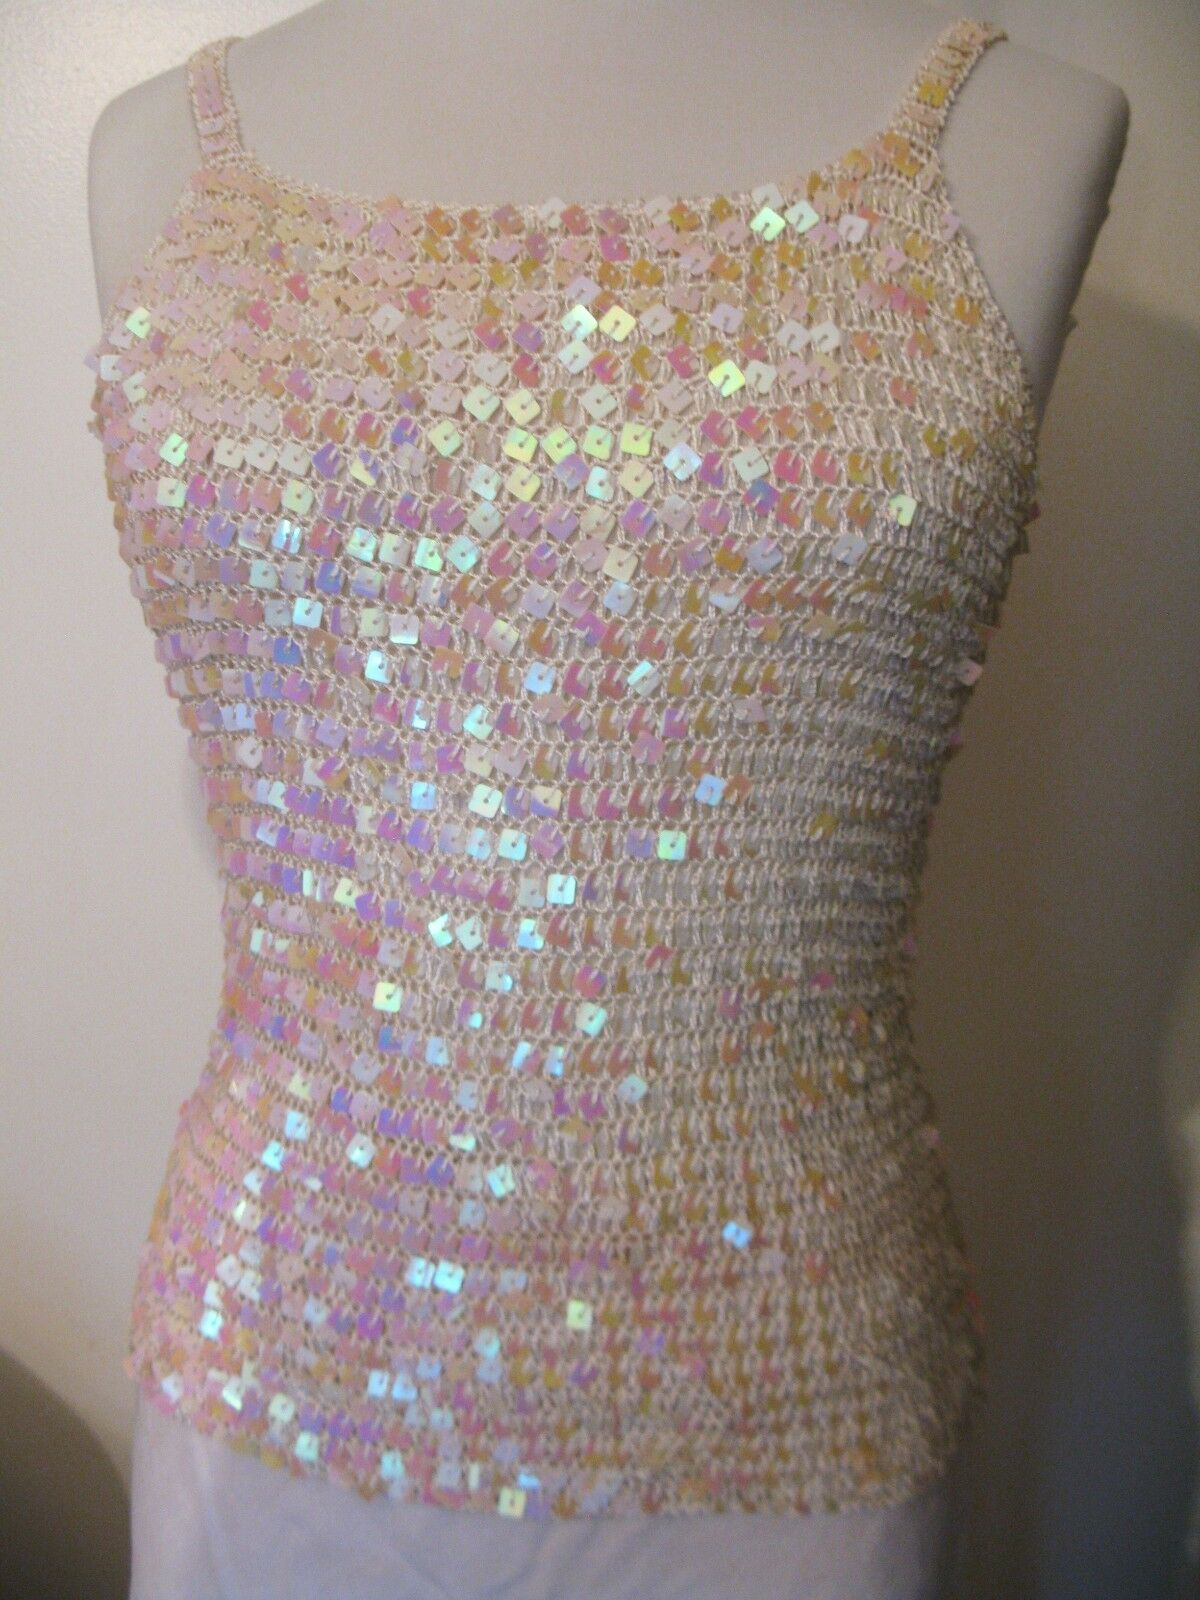 Designer Party Formal Bridal Dance Bodycon Cotton Candy Crochet Sequin Top S